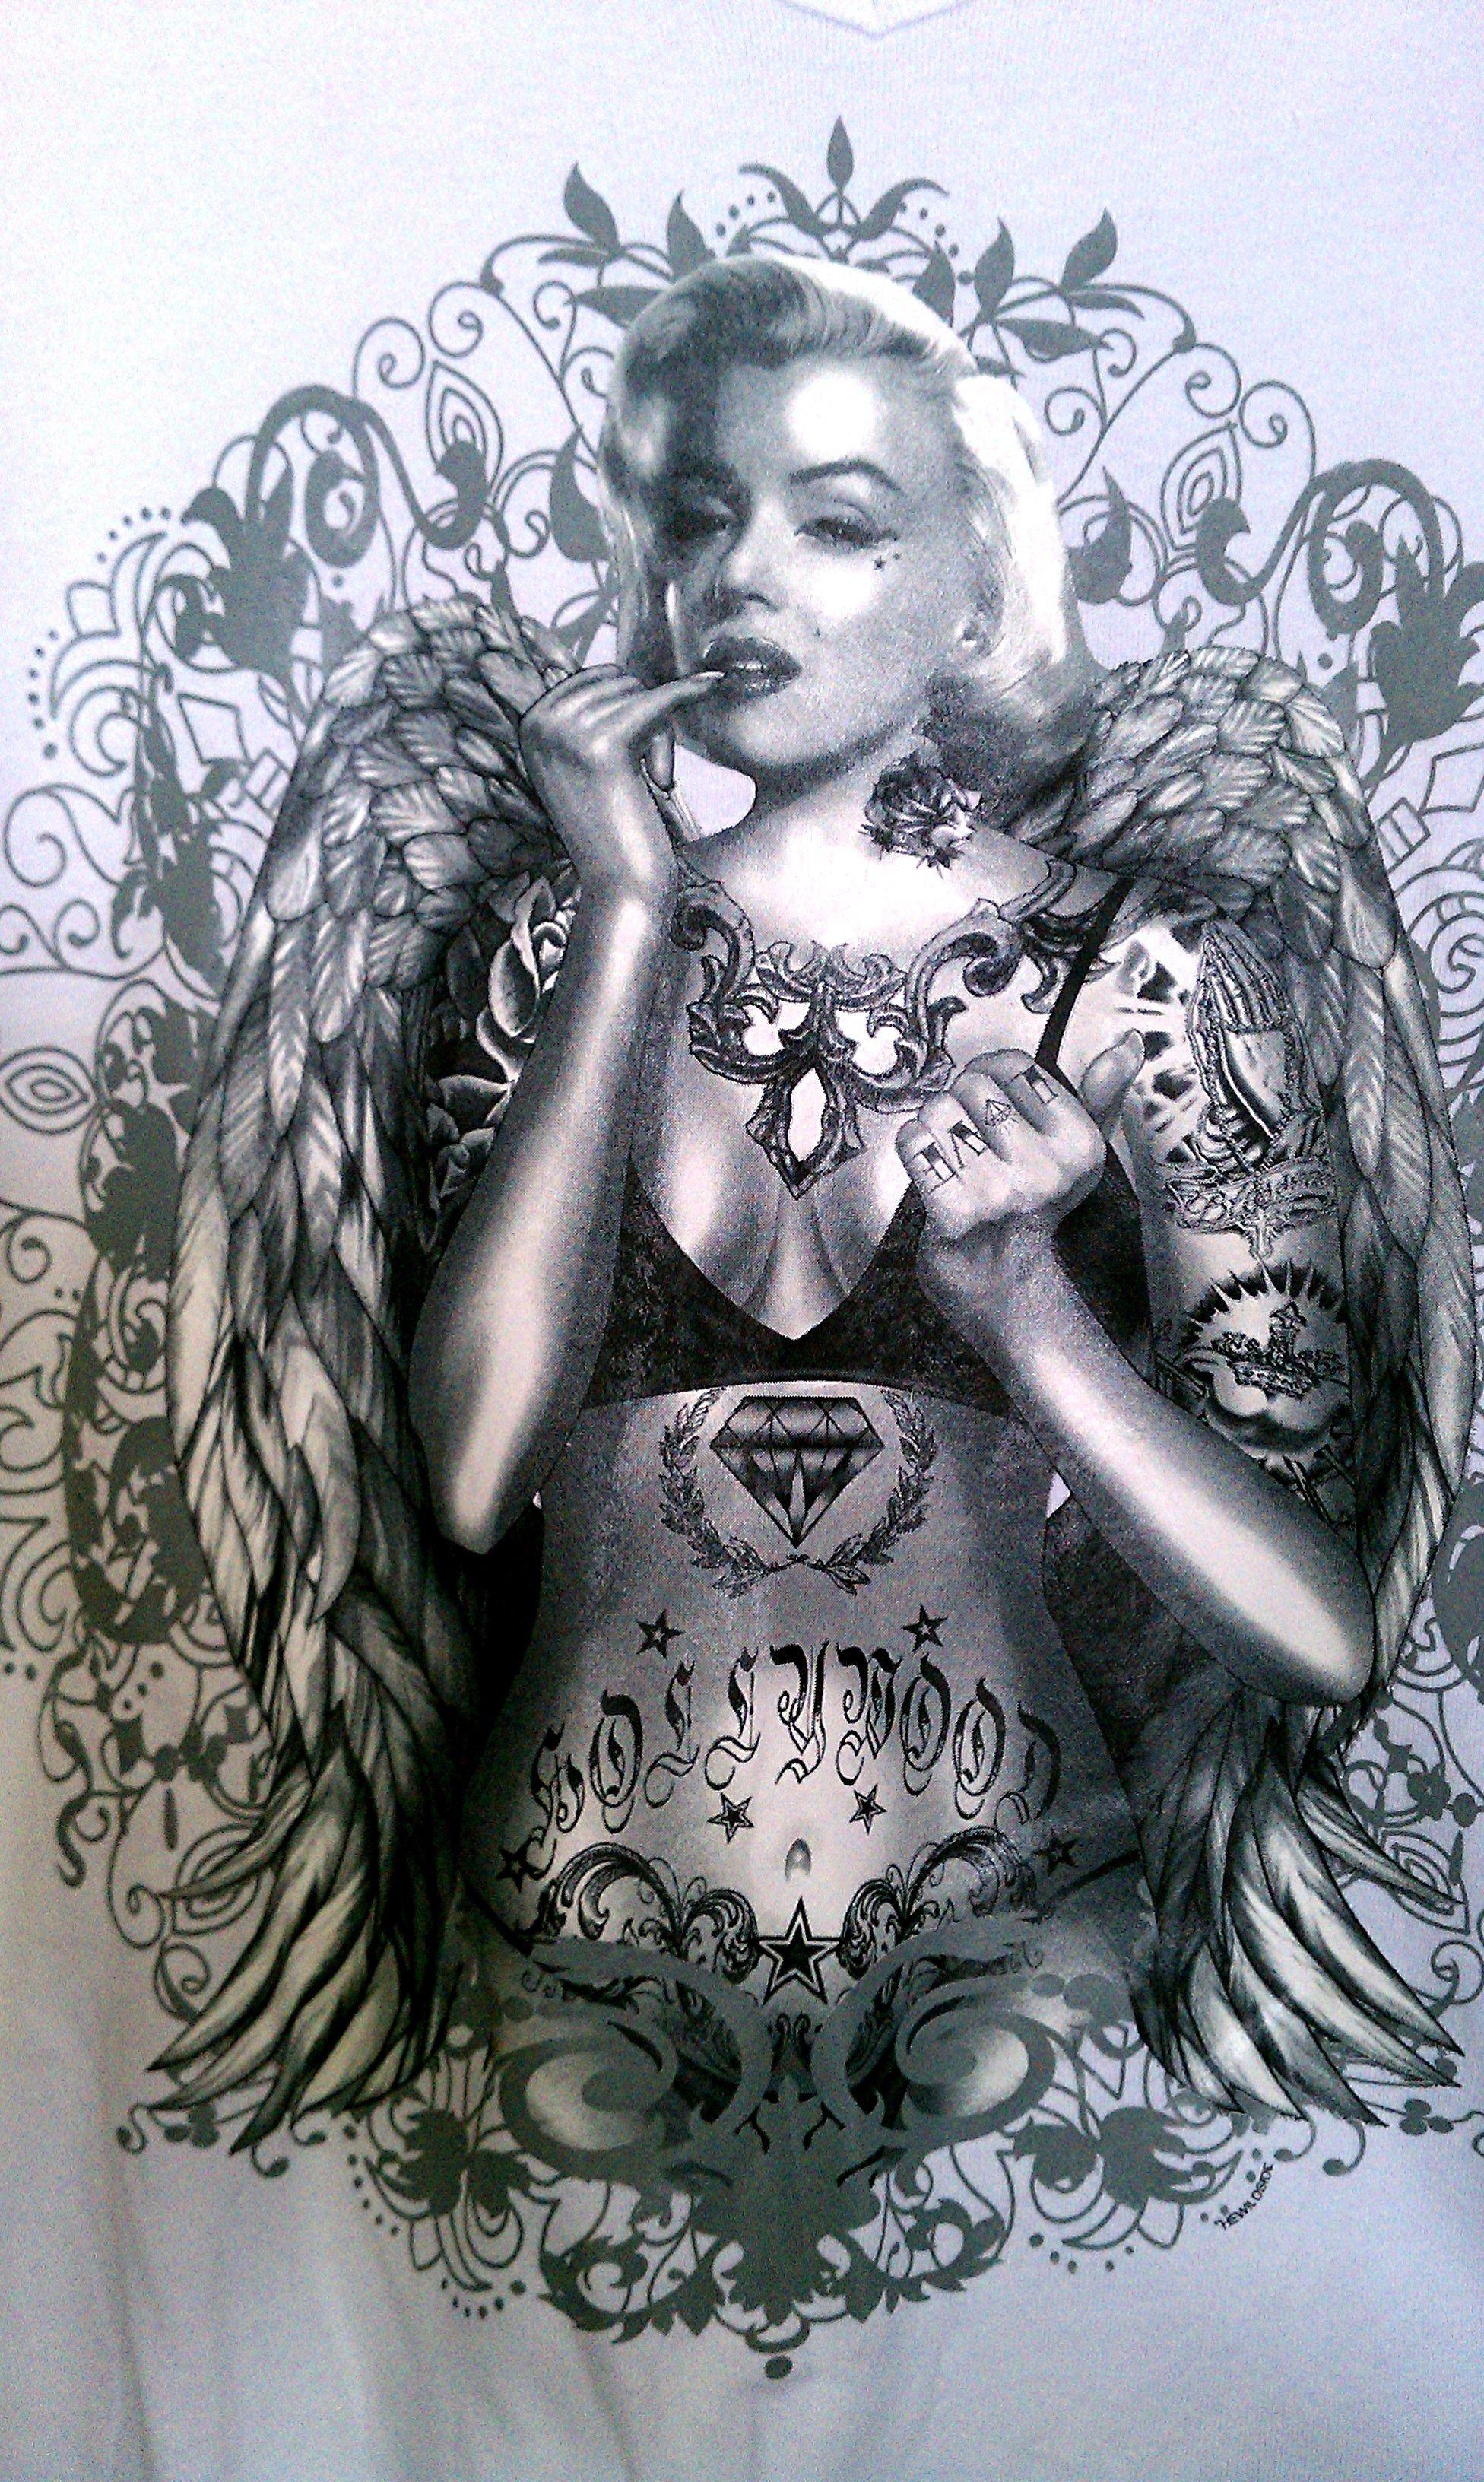 Tattooed Marilyn Monroe Wallpaper 63 Images